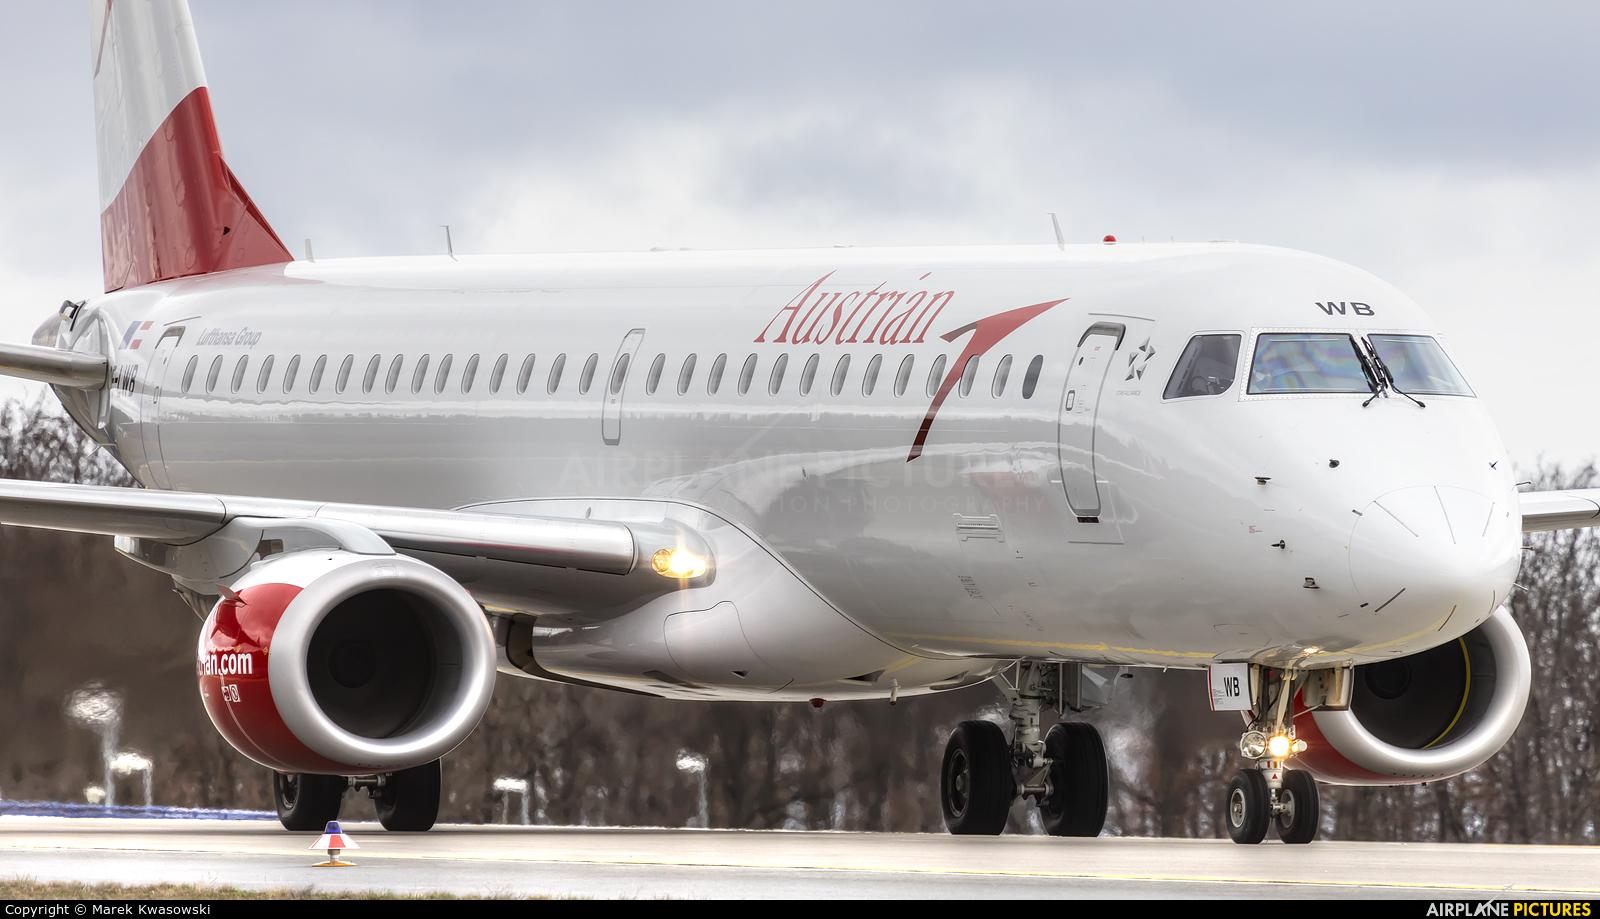 Austrian Airlines/Arrows/Tyrolean OE-LWB aircraft at Frankfurt